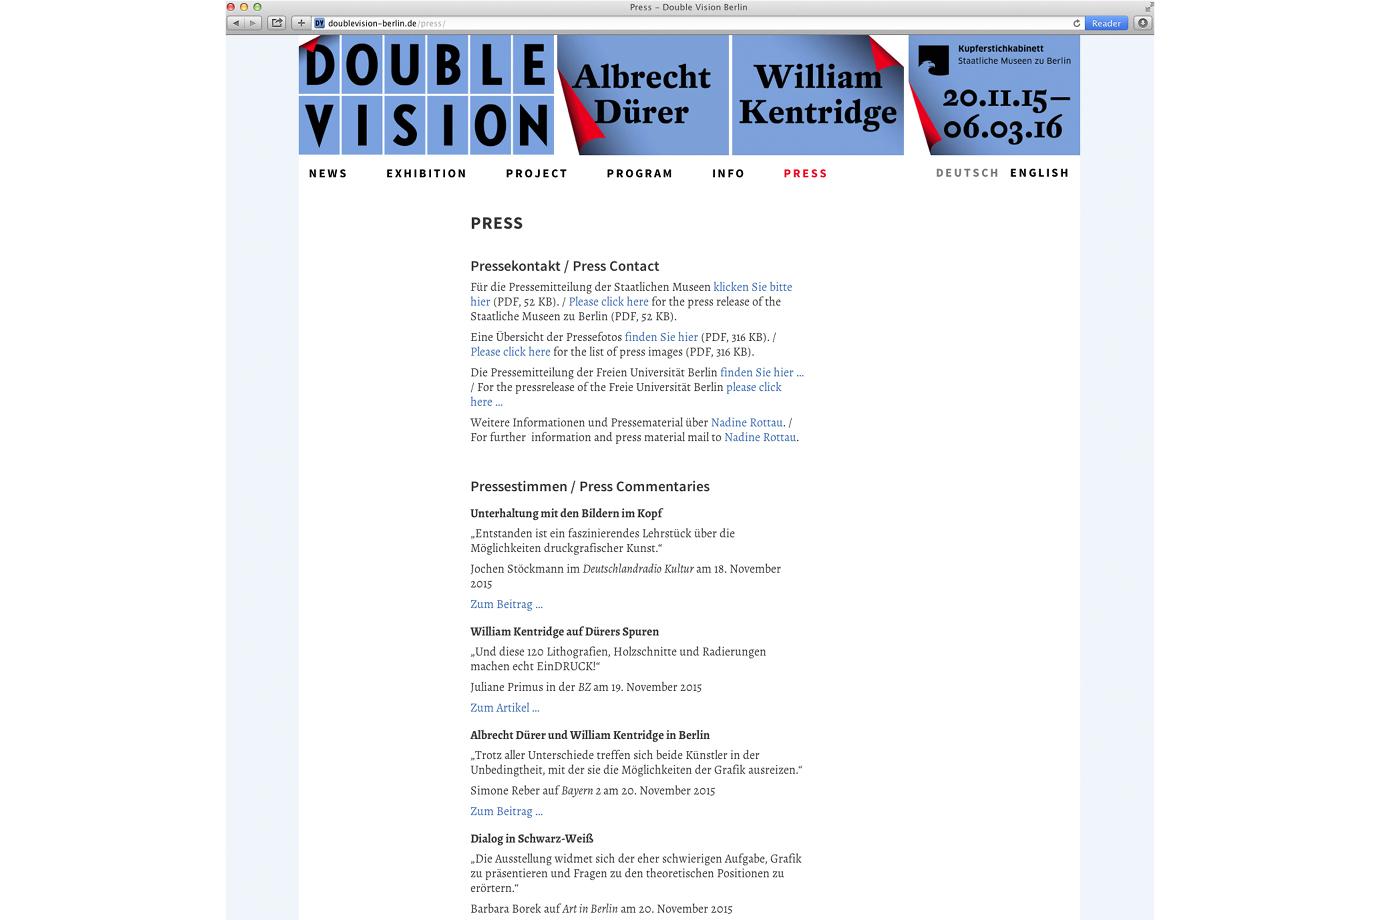 http://e-o-t.de/wordpress/wp-content/uploads/2017/11/2014_eot-DoubleVision-Web-03.jpg